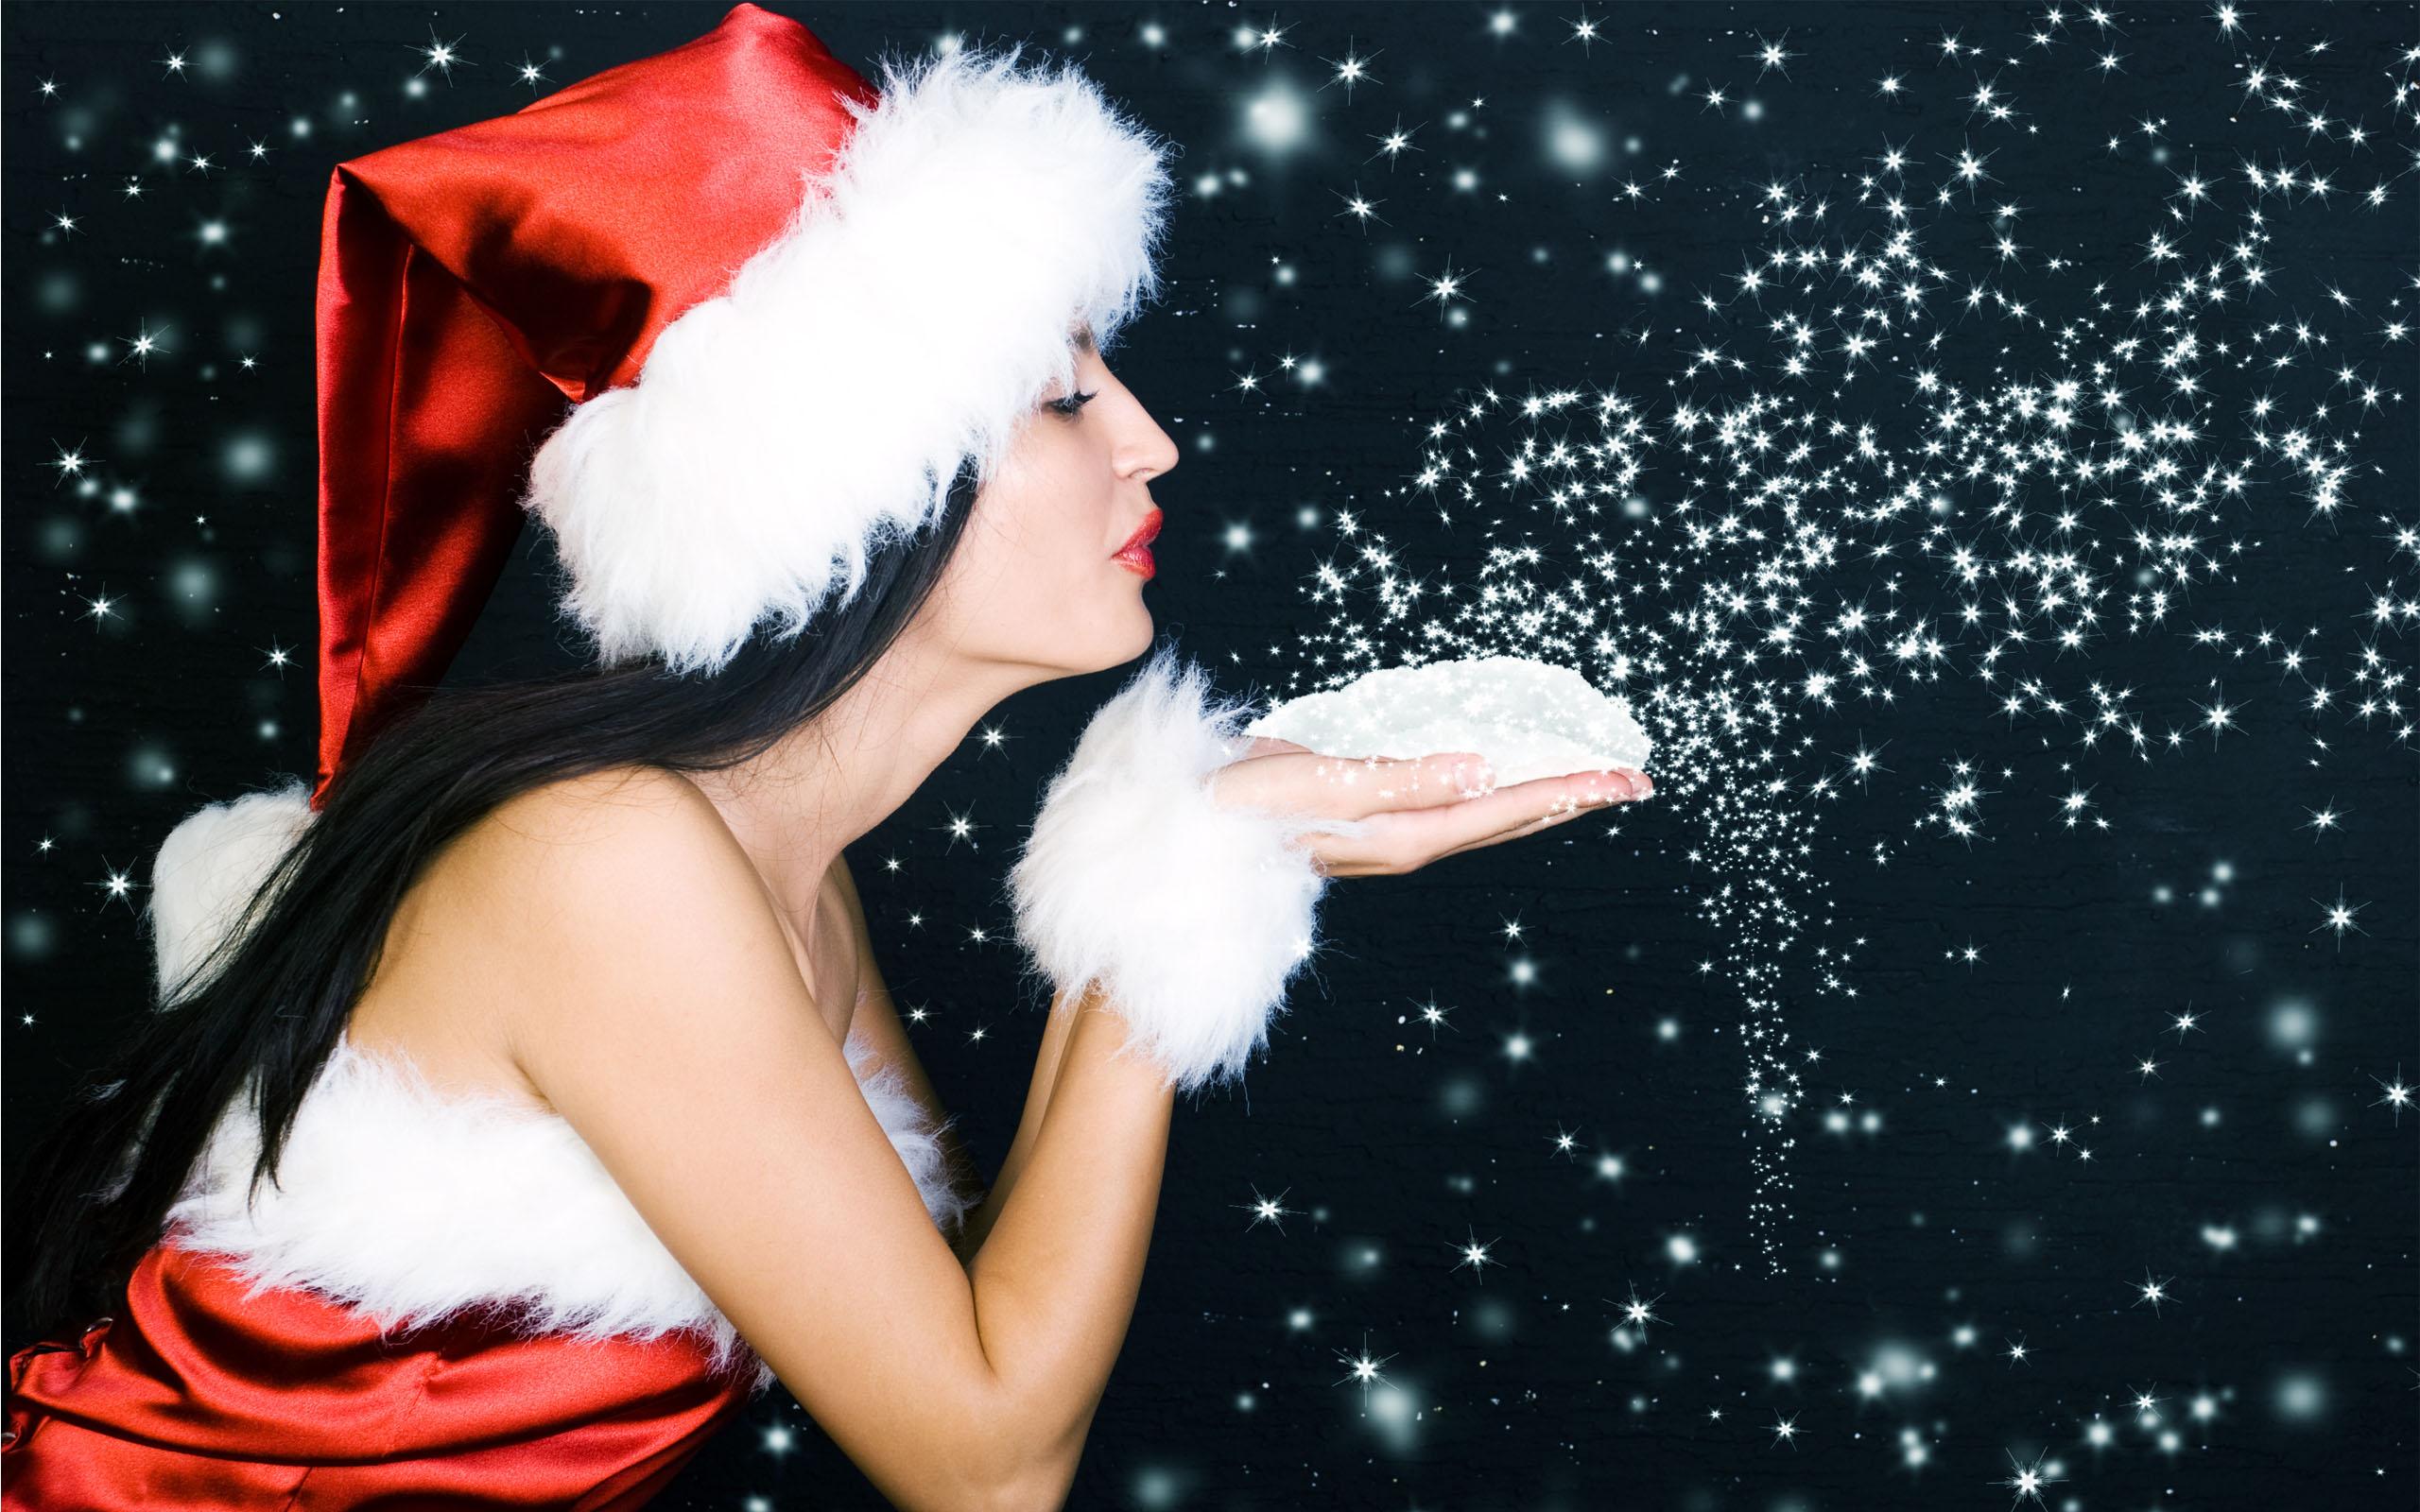 HD Wallpapers Beautiful Christmas Sanata Babe